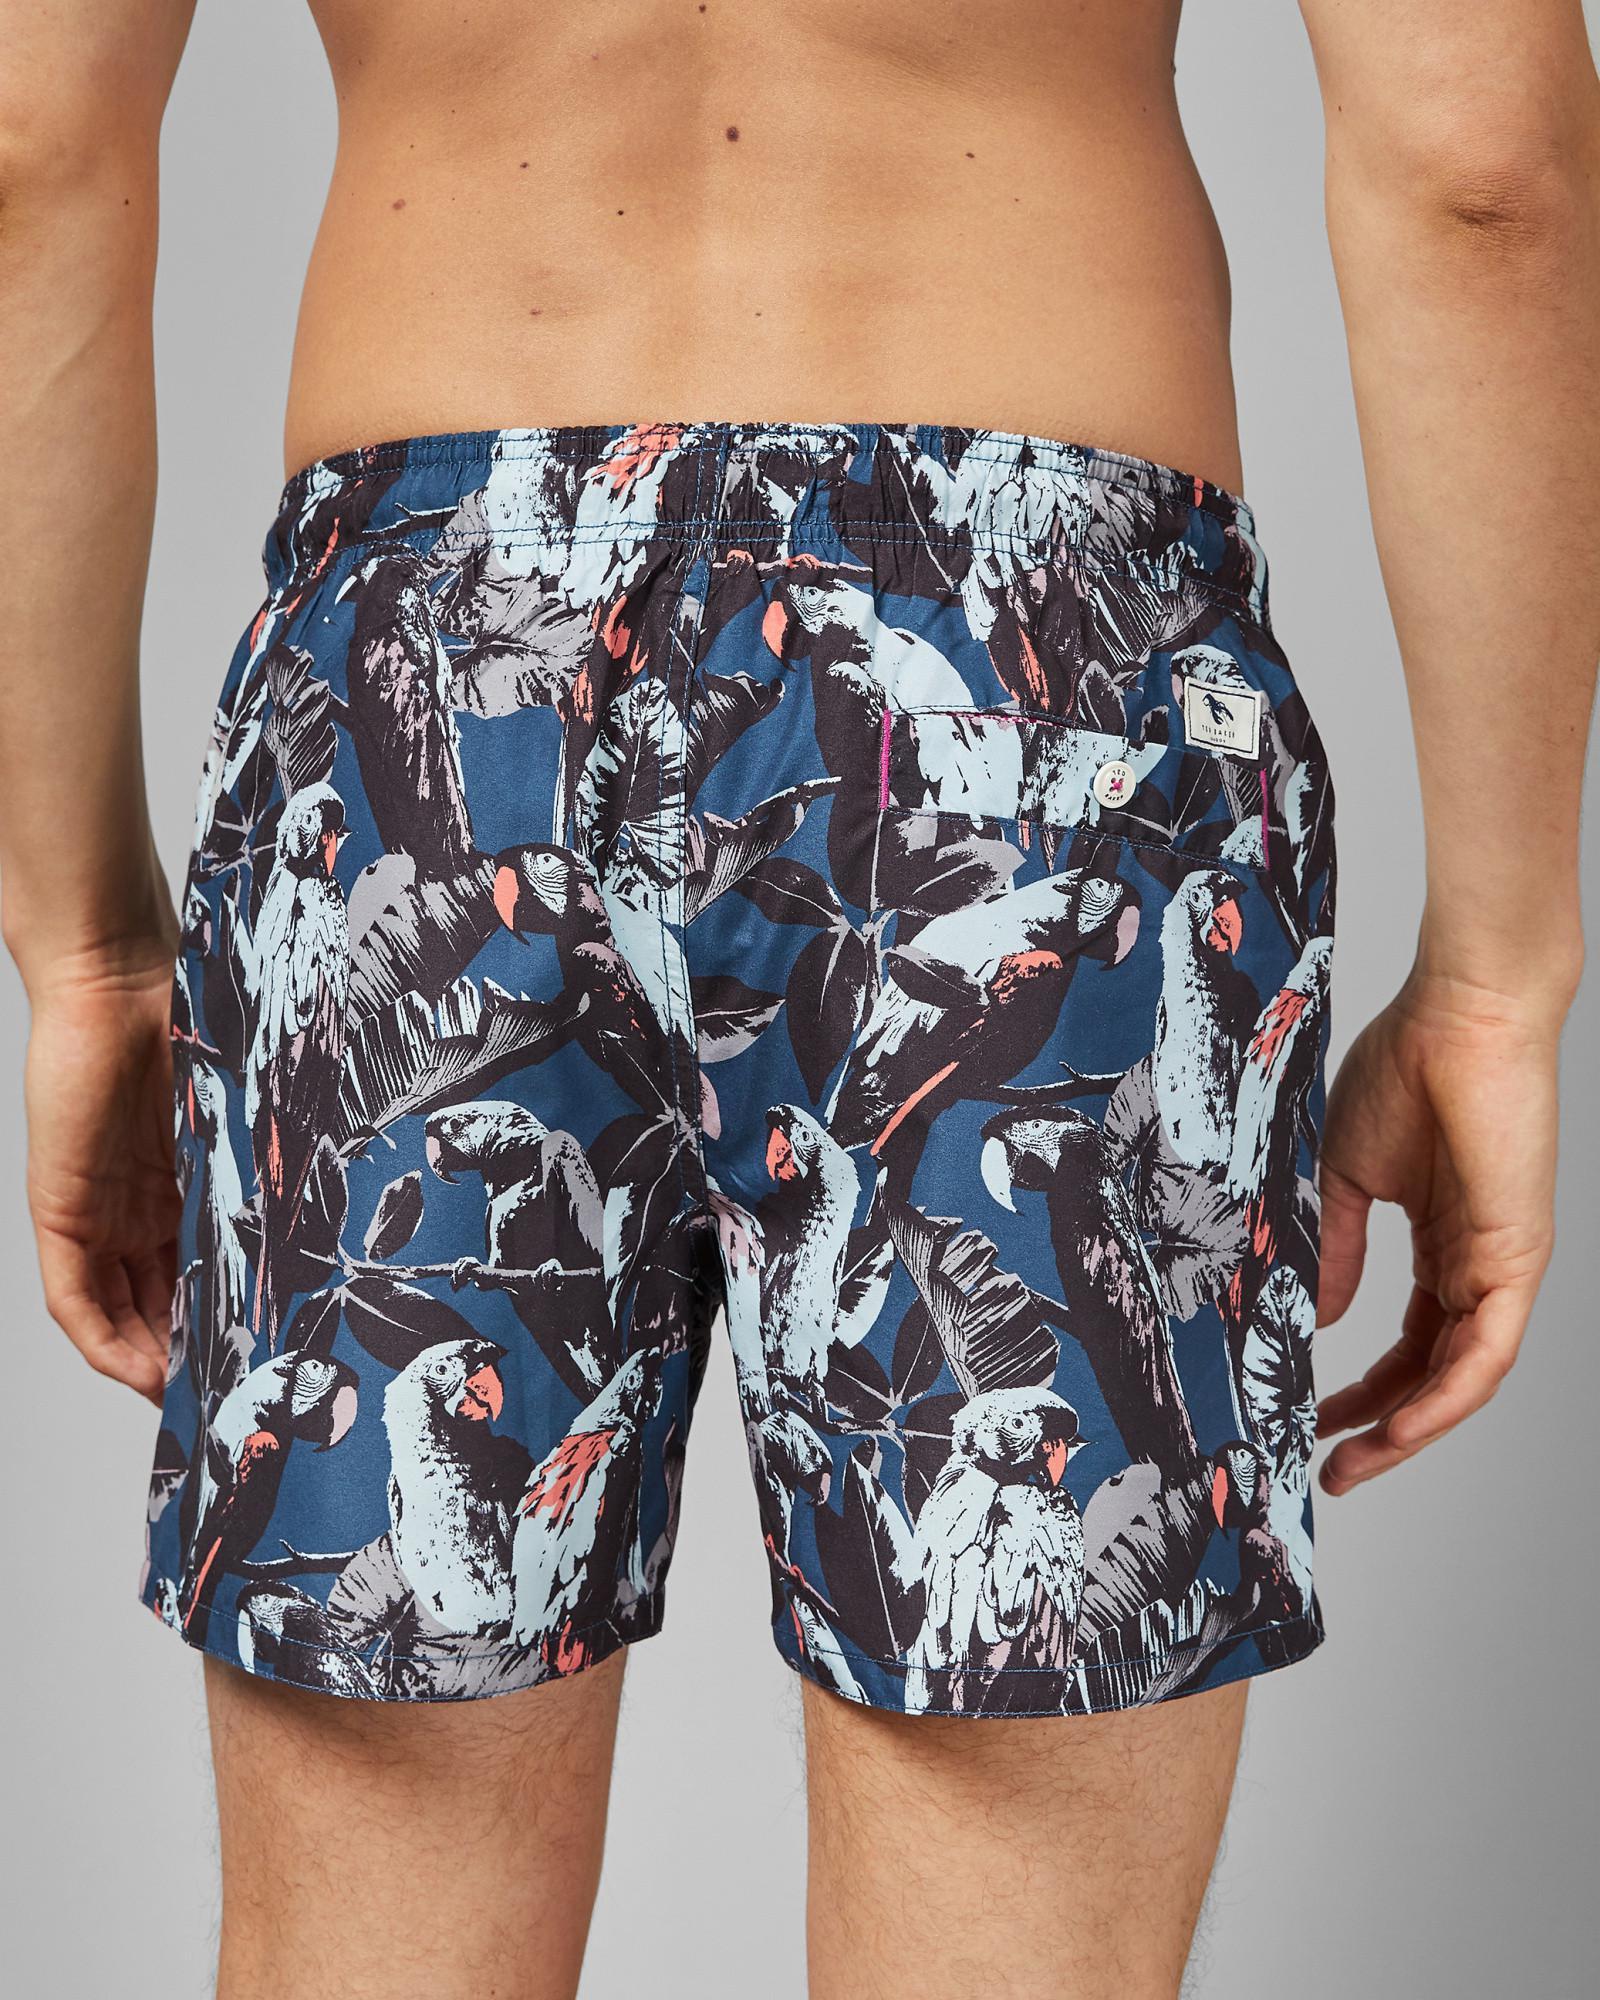 b10b114ec11 Lyst - Ted Baker Coastal Parrot Print Shorty Swim Shorts in Blue for Men